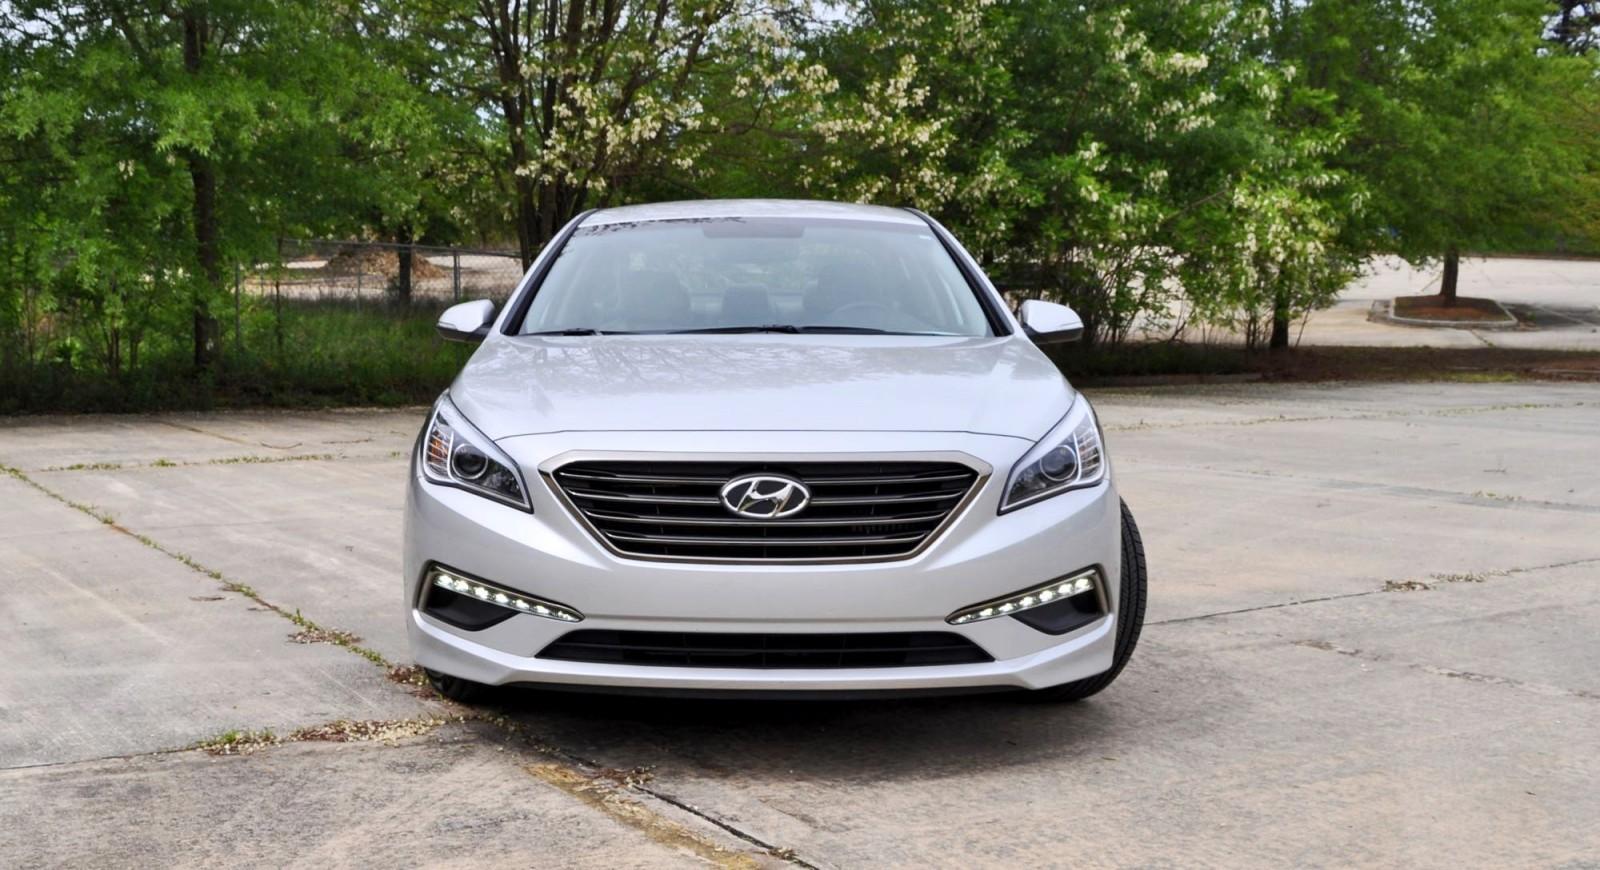 2015 Hyundai Sonata Eco Estimated to get 28/38 MPG - Motor ...   2015 Hyundai Sonata Eco